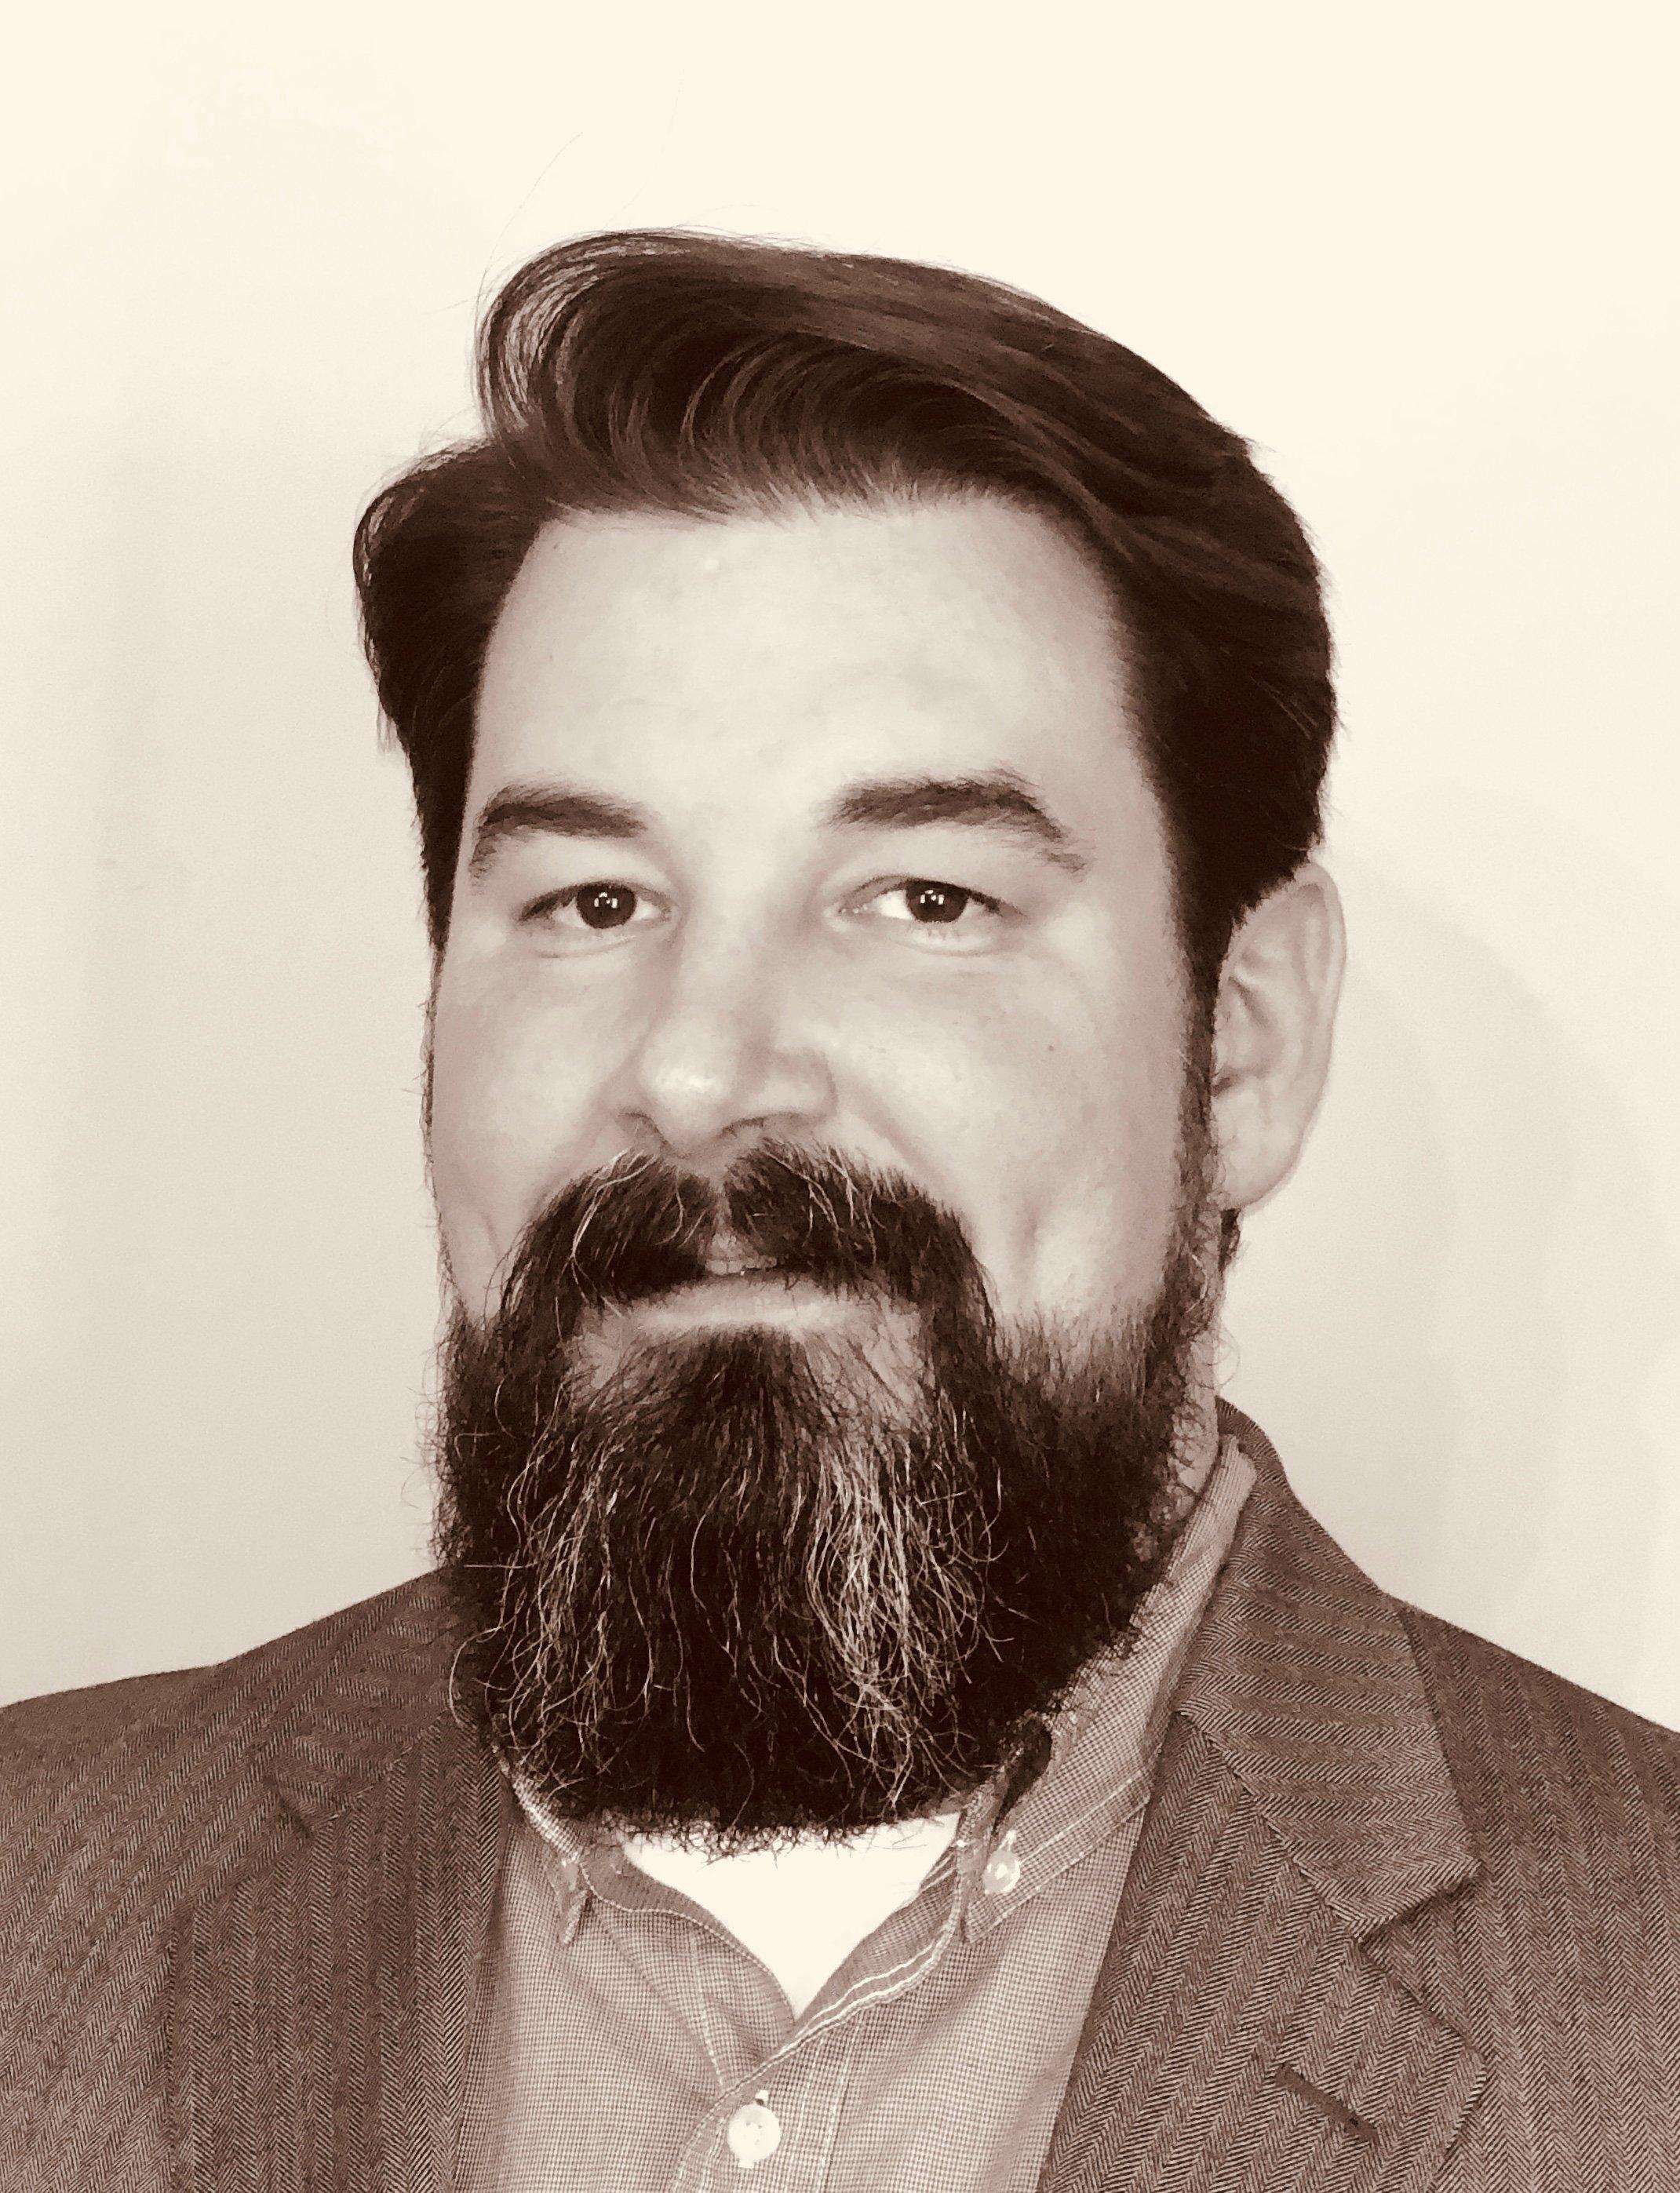 Dustin Dortch